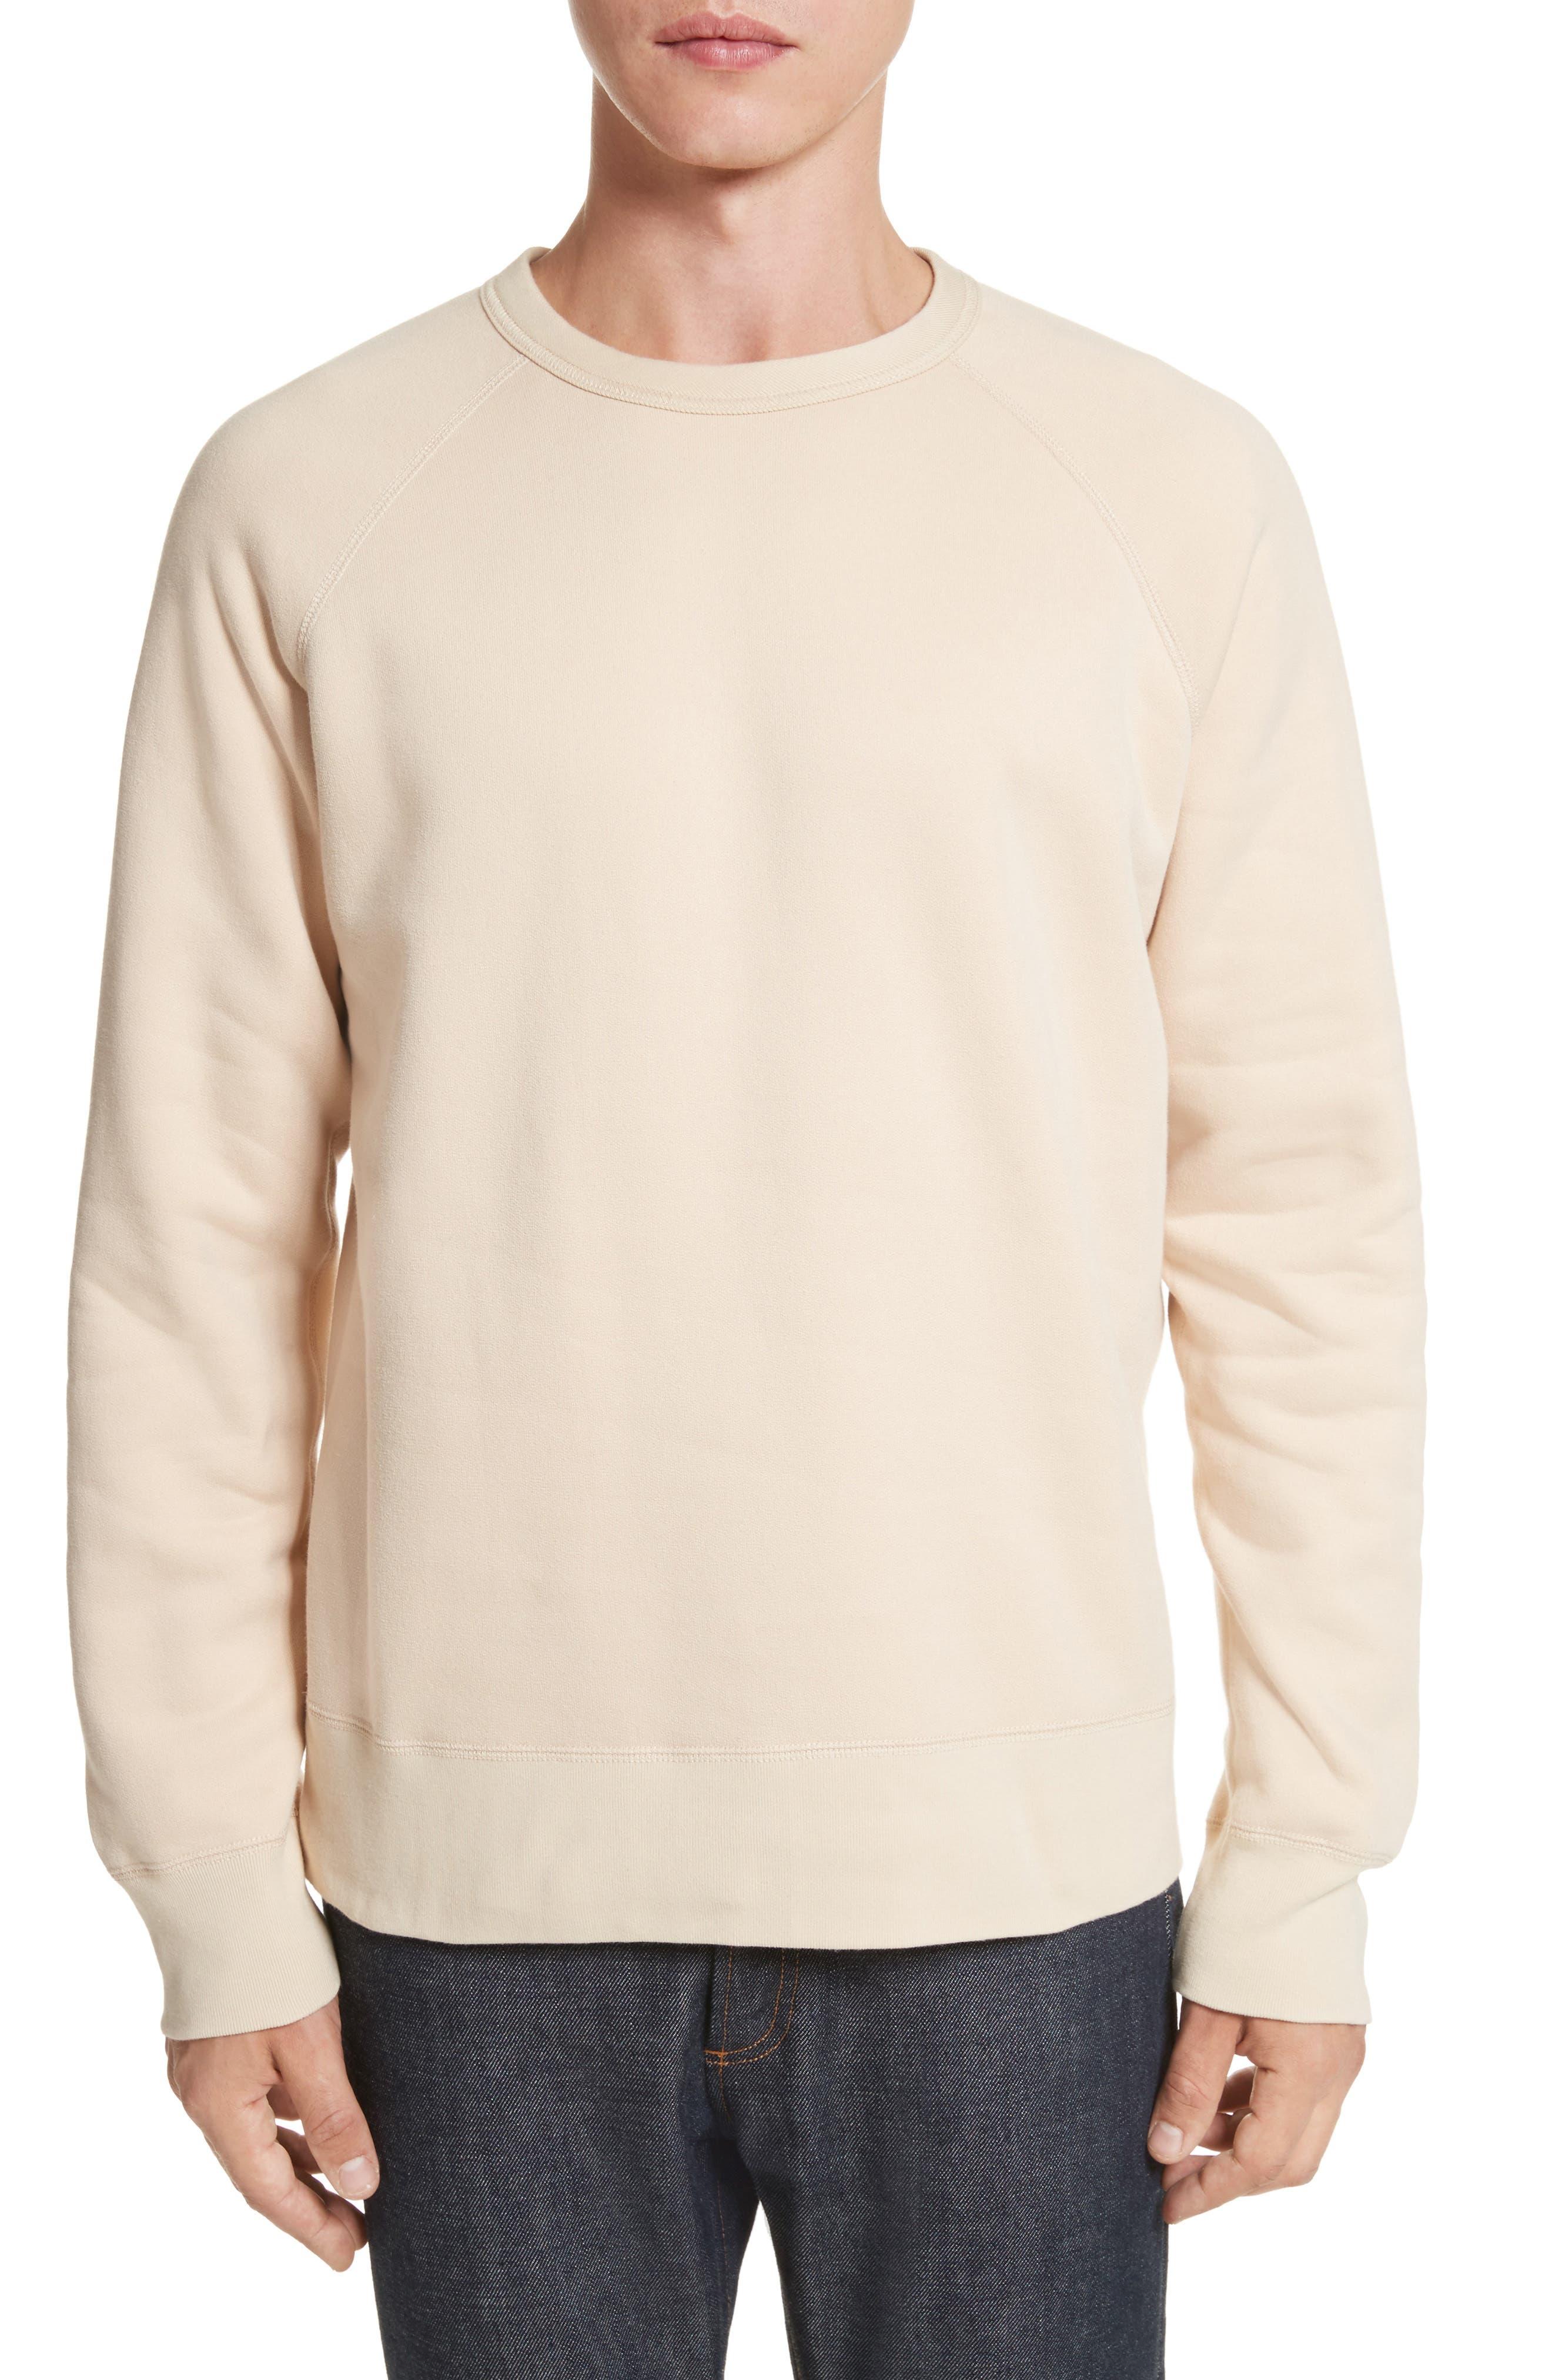 Reversible Raglan Crewneck Sweatshirt,                             Main thumbnail 1, color,                             Beige